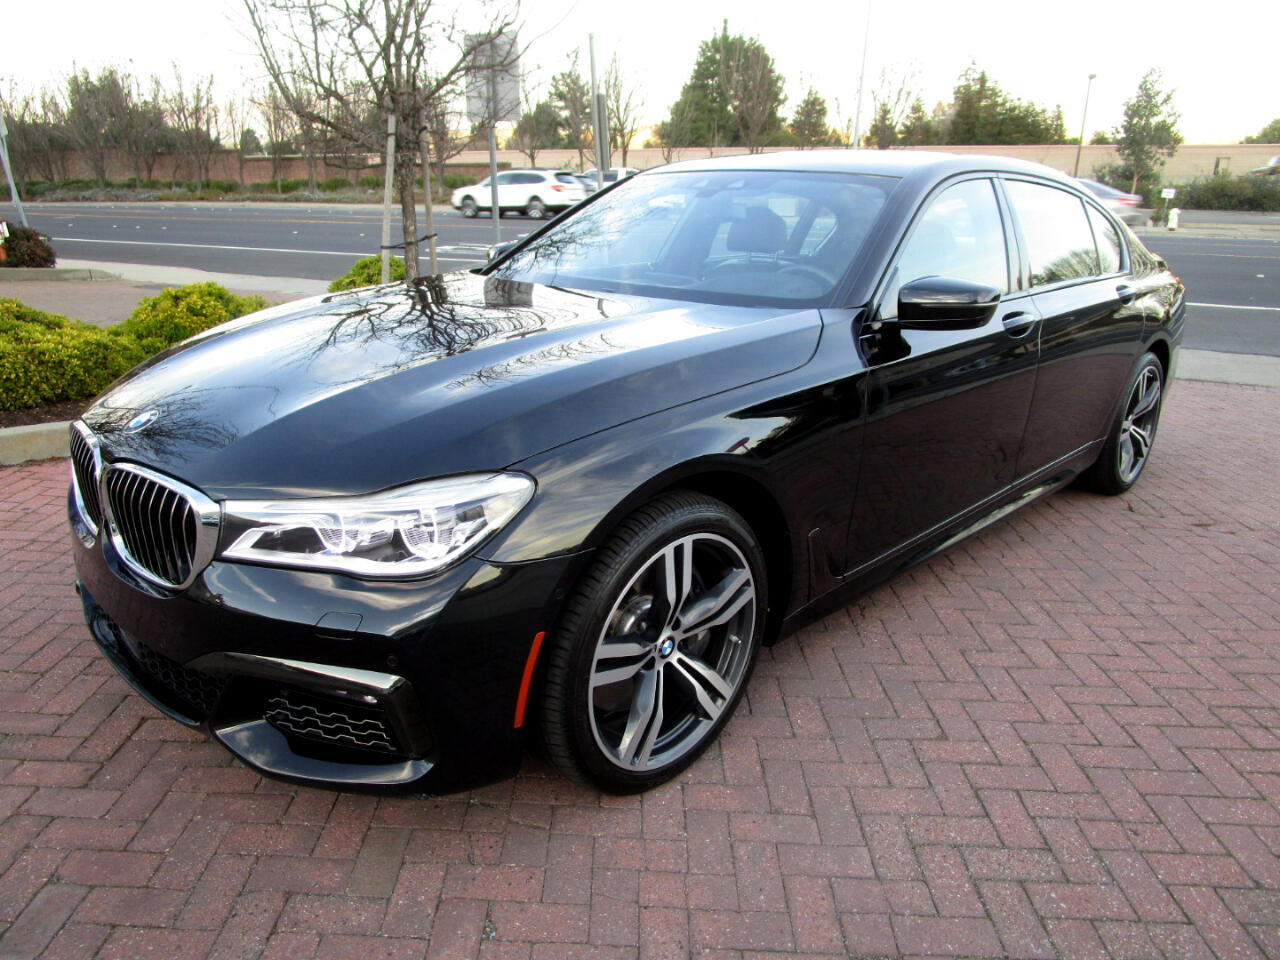 2016 BMW 750i xDrive MSRP $130K*AUTOBAHN PKG*DRIVER ASSIST PLUS*EXEC*